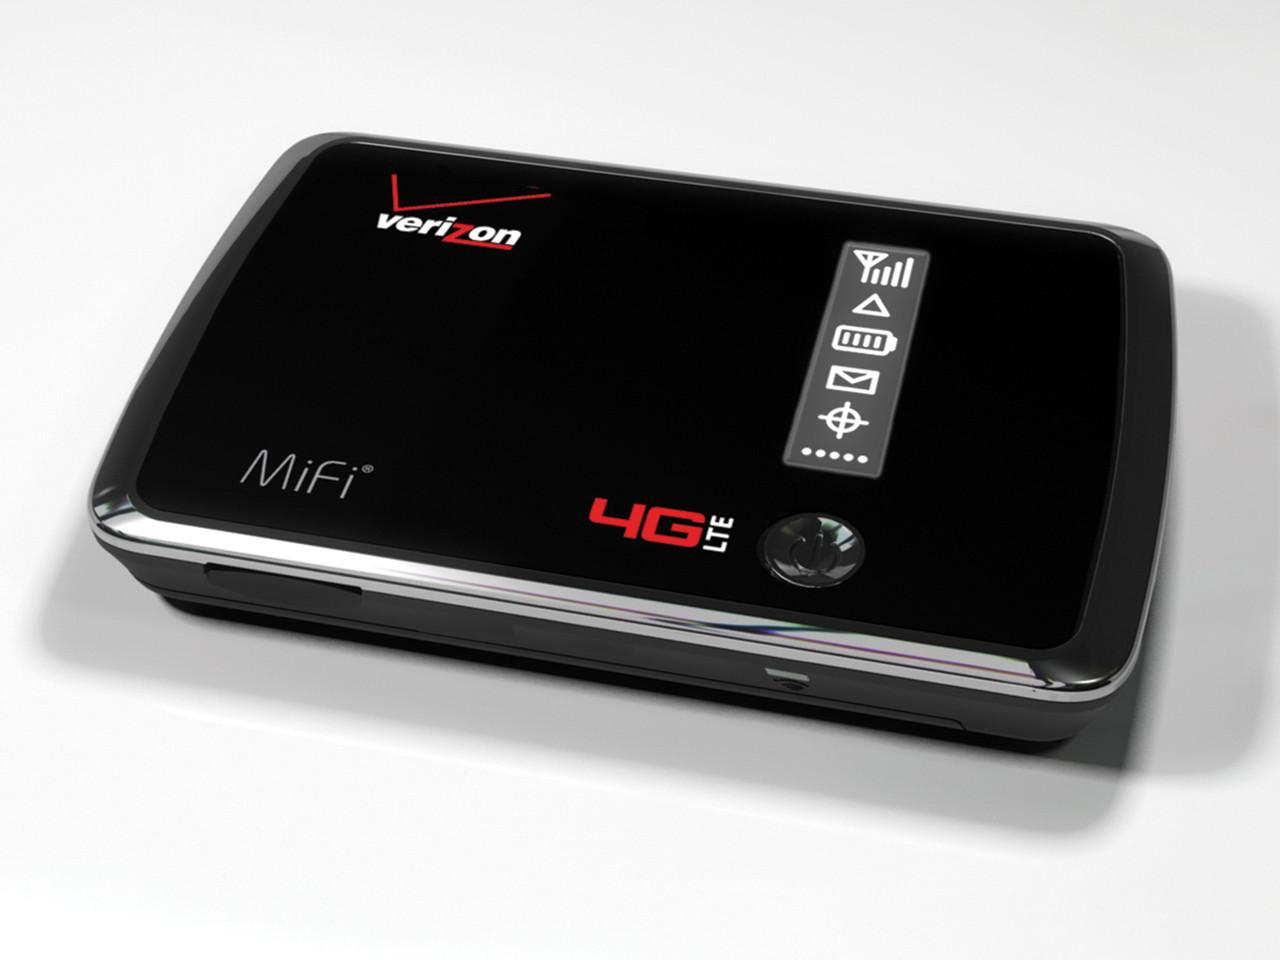 3G WiFi роутер Novatel MiFi 4510L Интертелеком с выходом под антенну